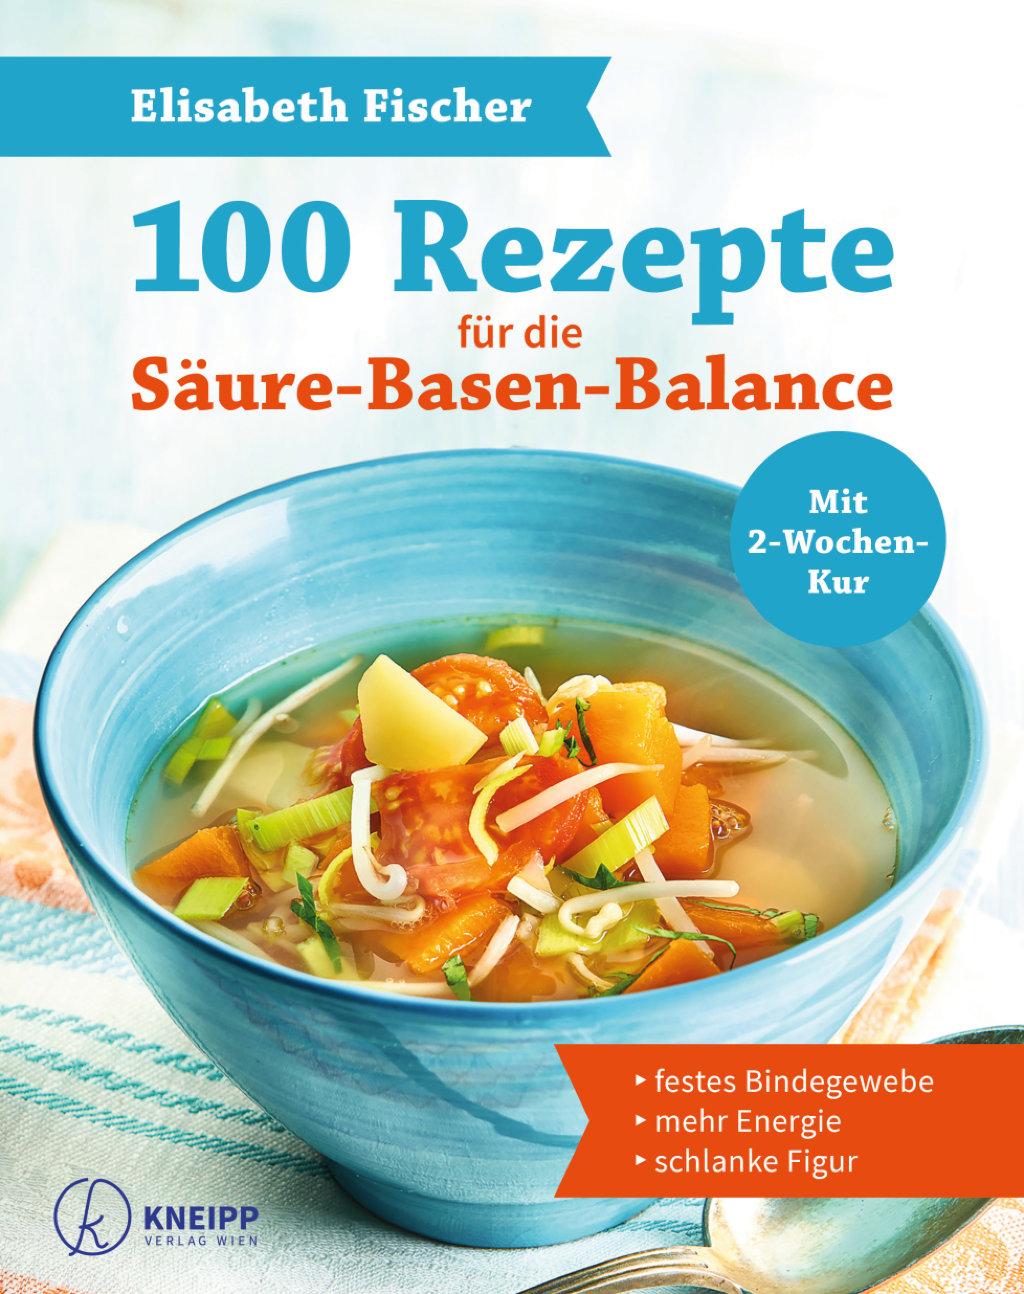 Elisabeth Fischer kocht – Categories – Vegan – Vegetarisch